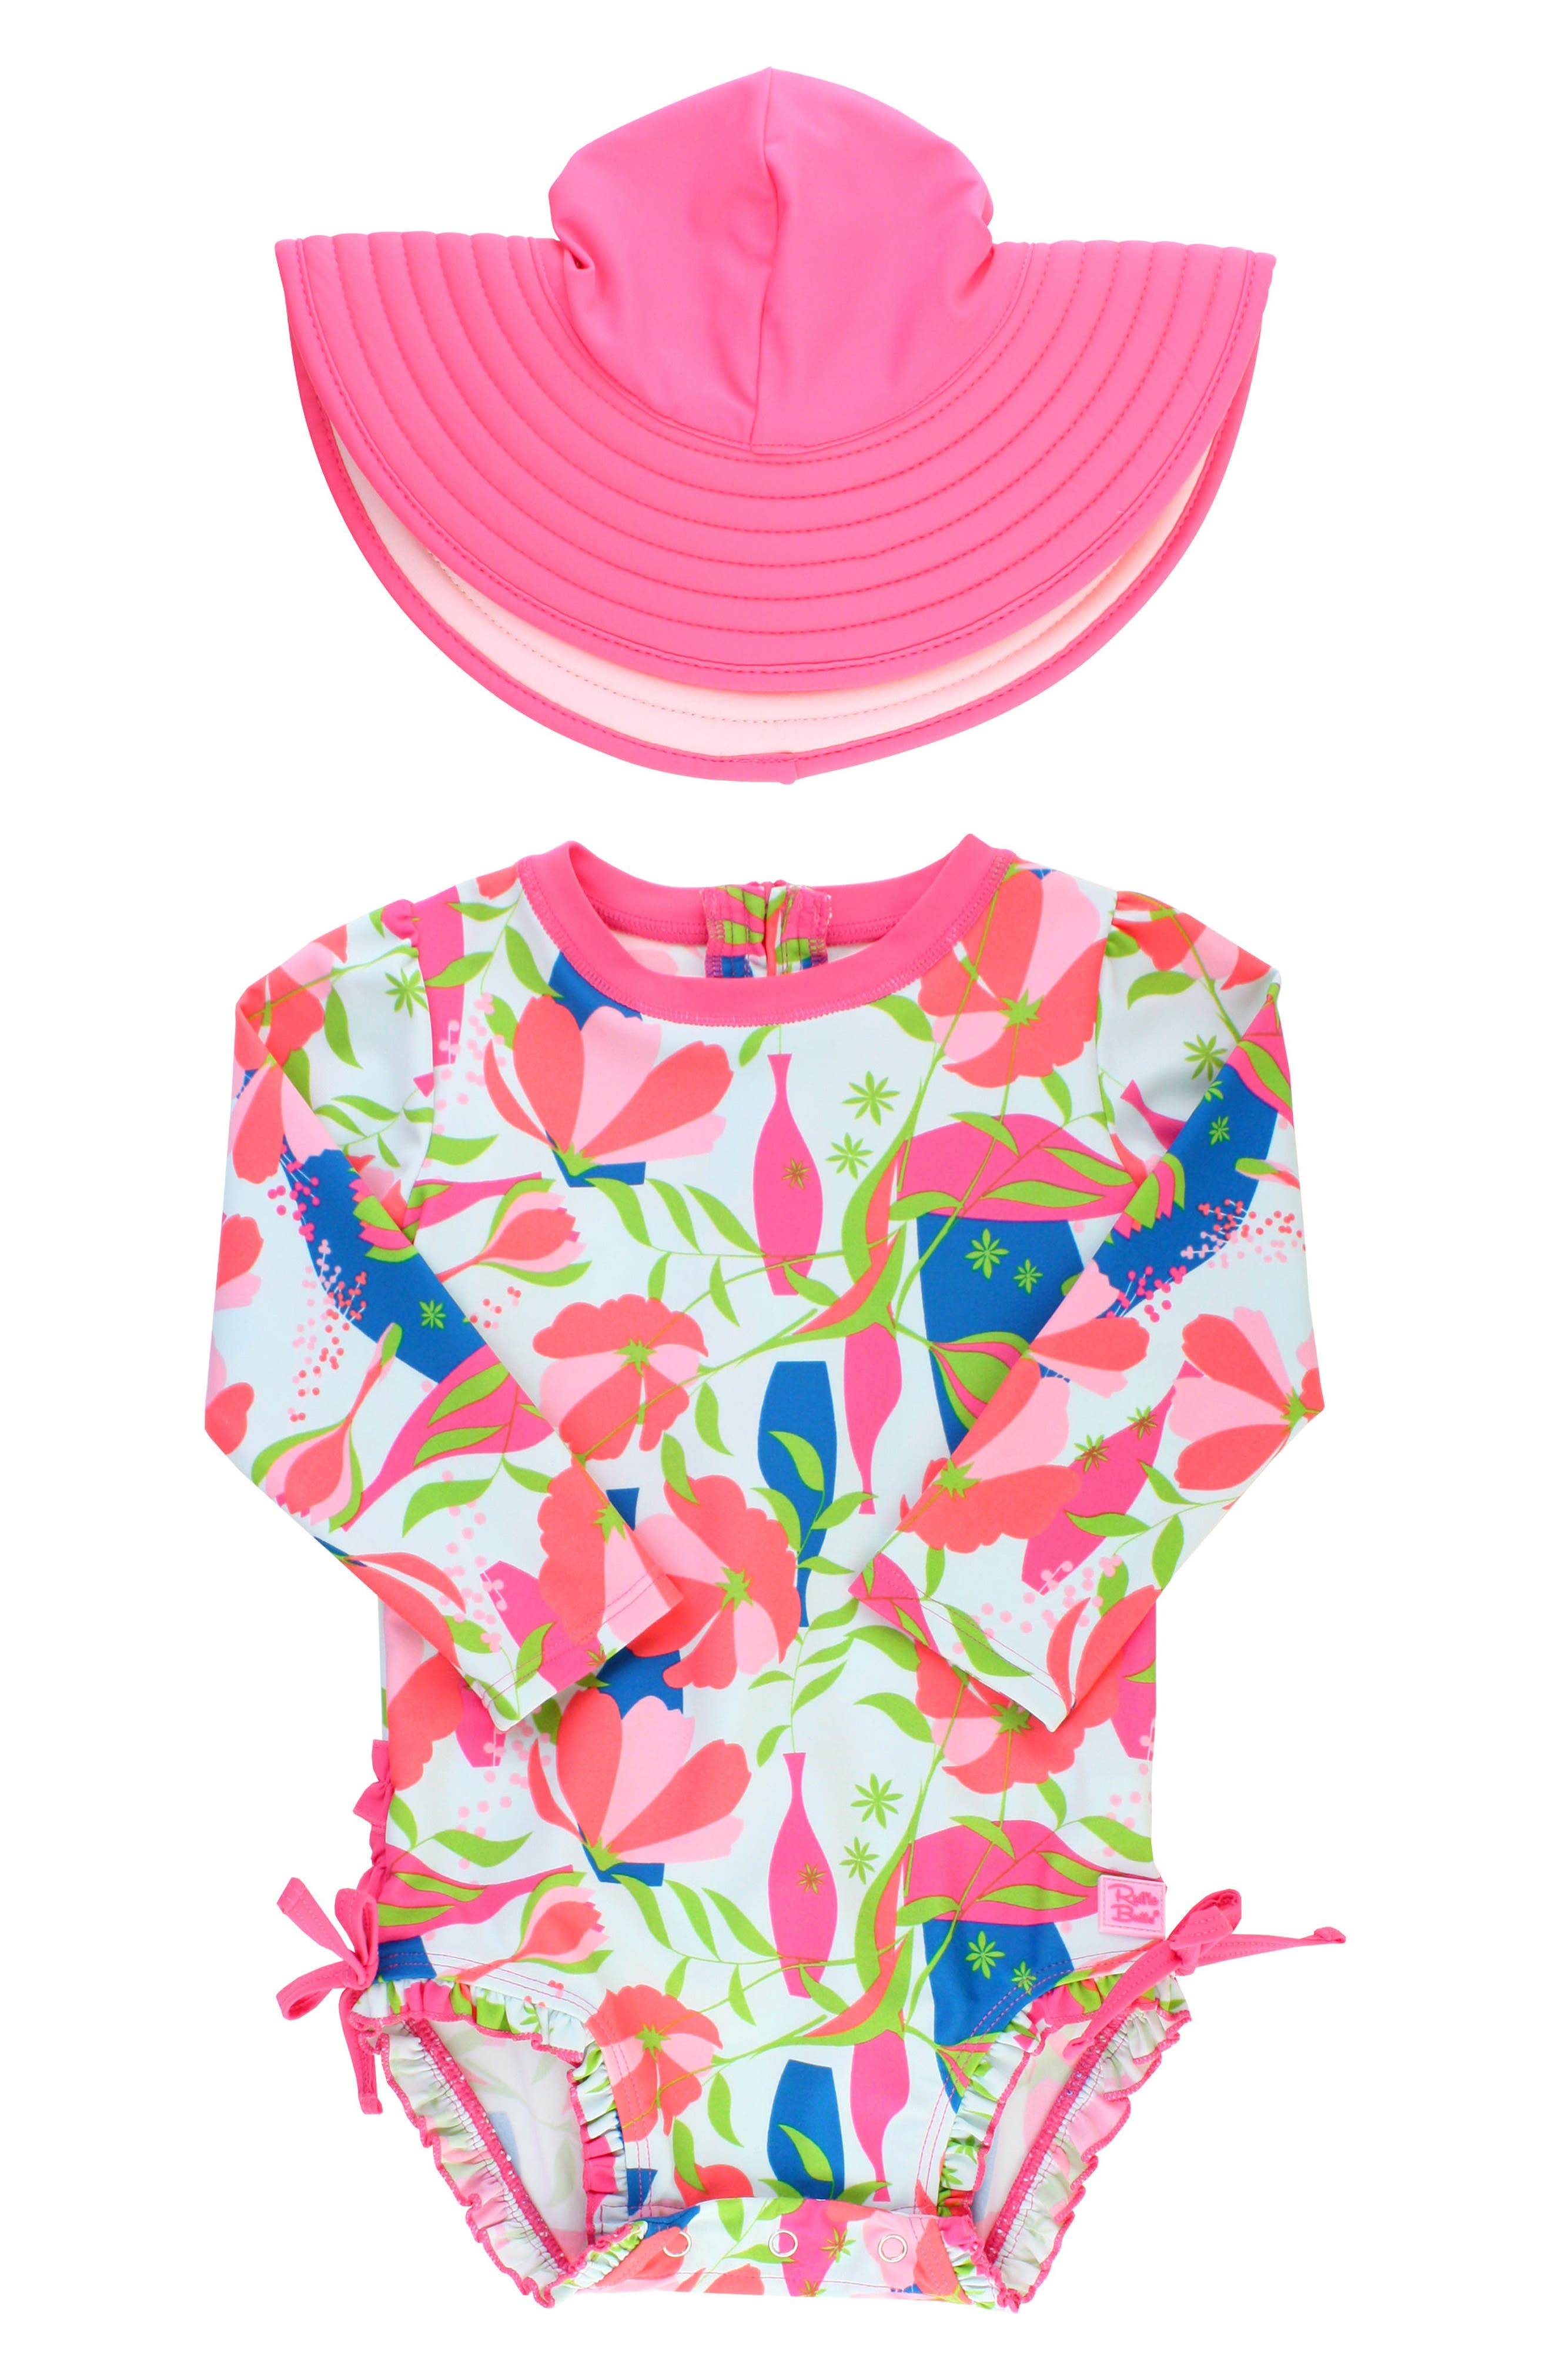 Alternate Image 1 Selected - Ruffle Butts Jeweled Stems One-Piece Rashguard Swimsuit & Sun Hat Set (Baby Girls)